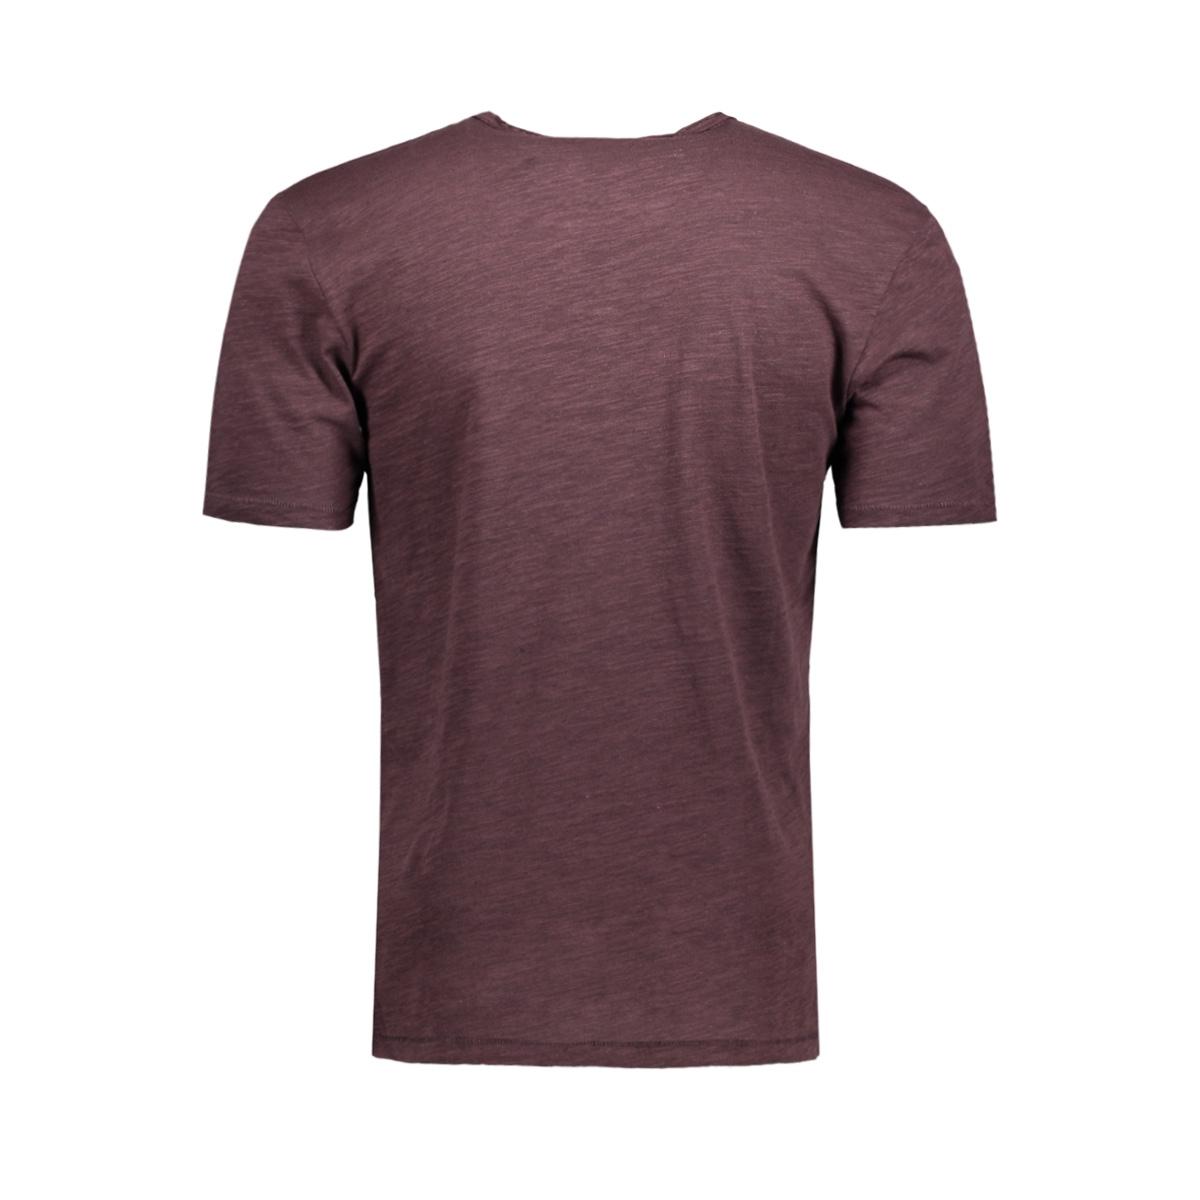 onsalbert new ss tee noos 22005108 only & sons t-shirt fudge